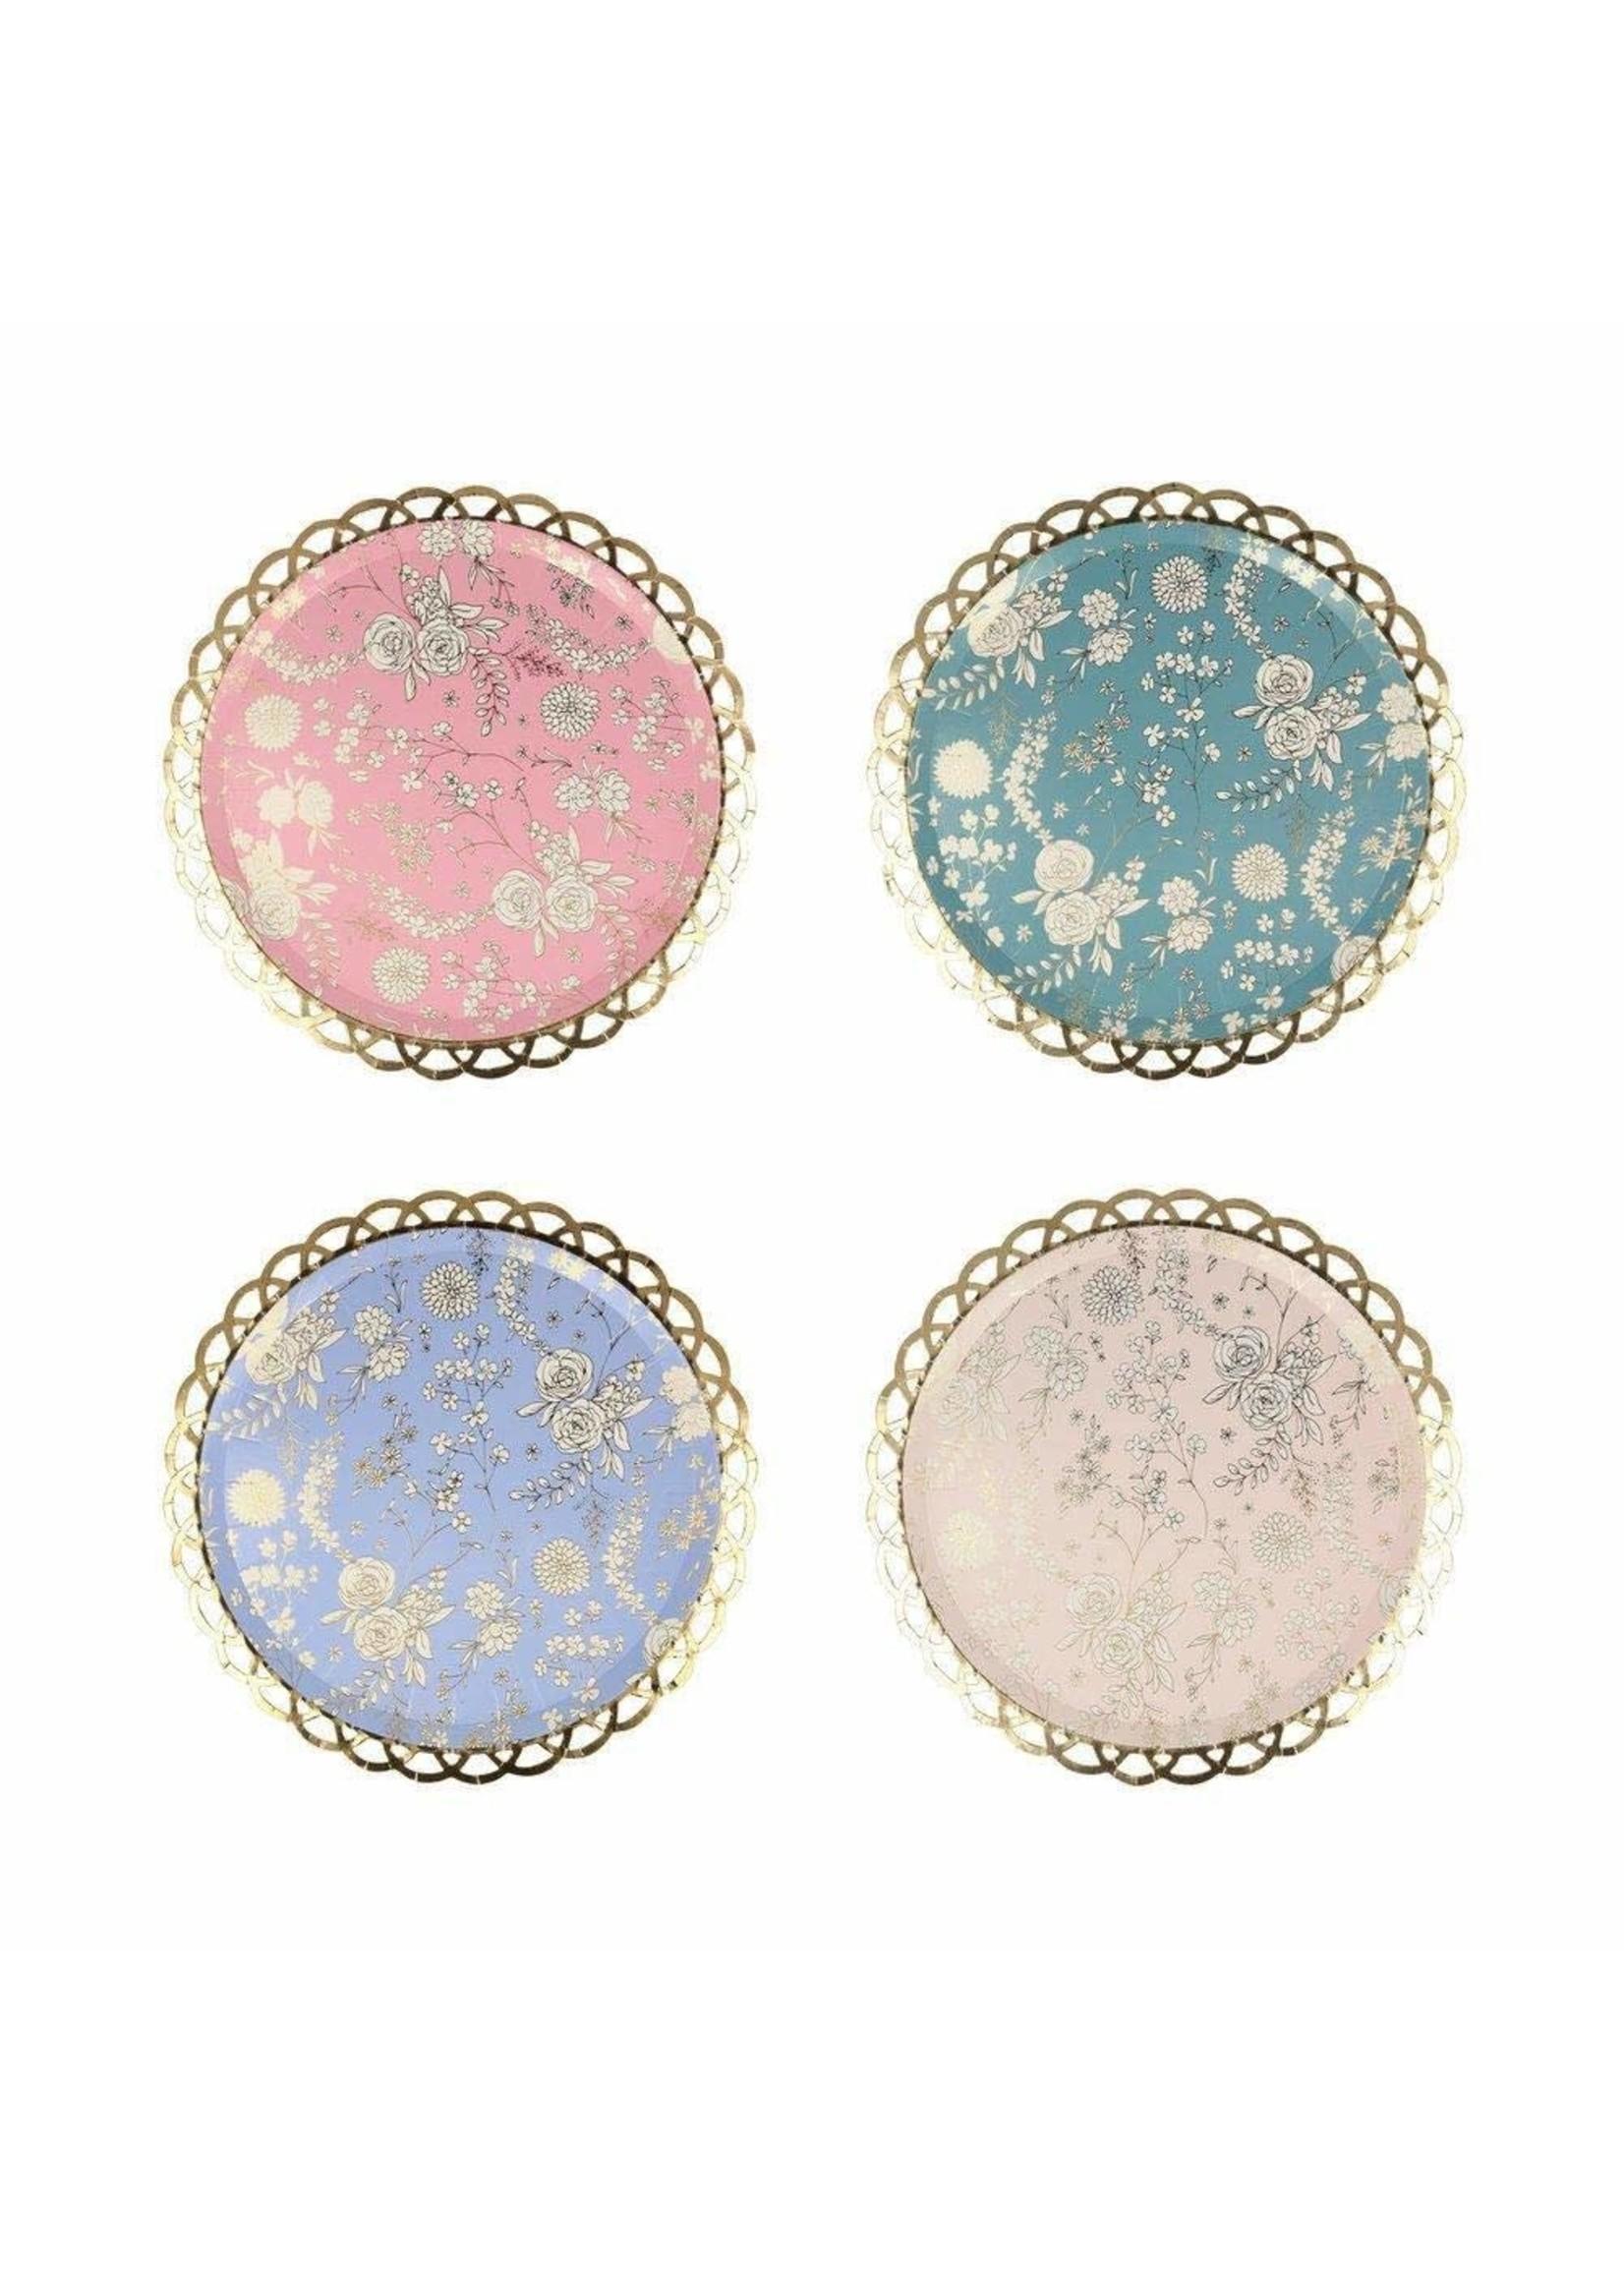 Meri Meri Paper Plates - English Garden Lace